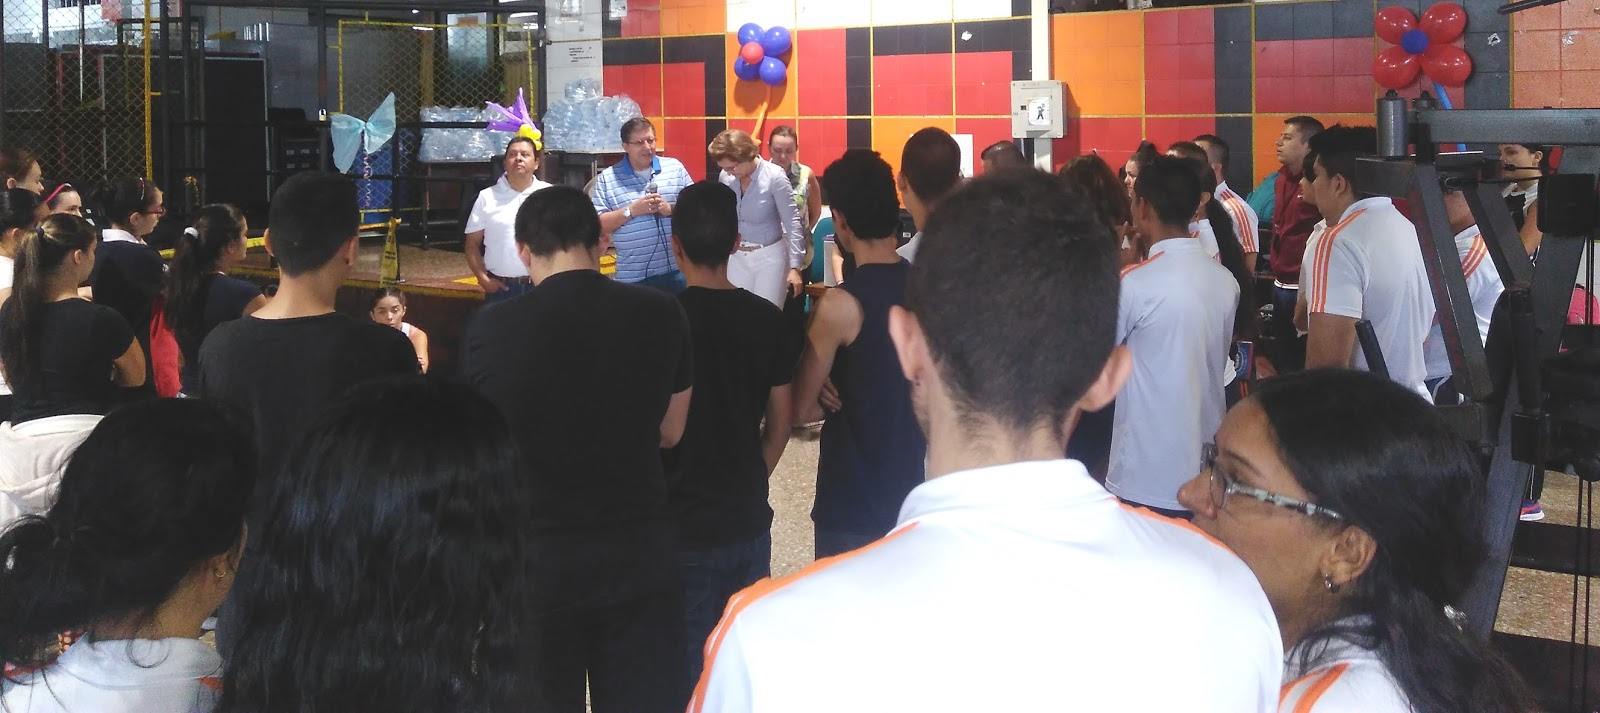 Notisena risaralda reinauguraci n del gimnasio del centro for Gimnasio del centro